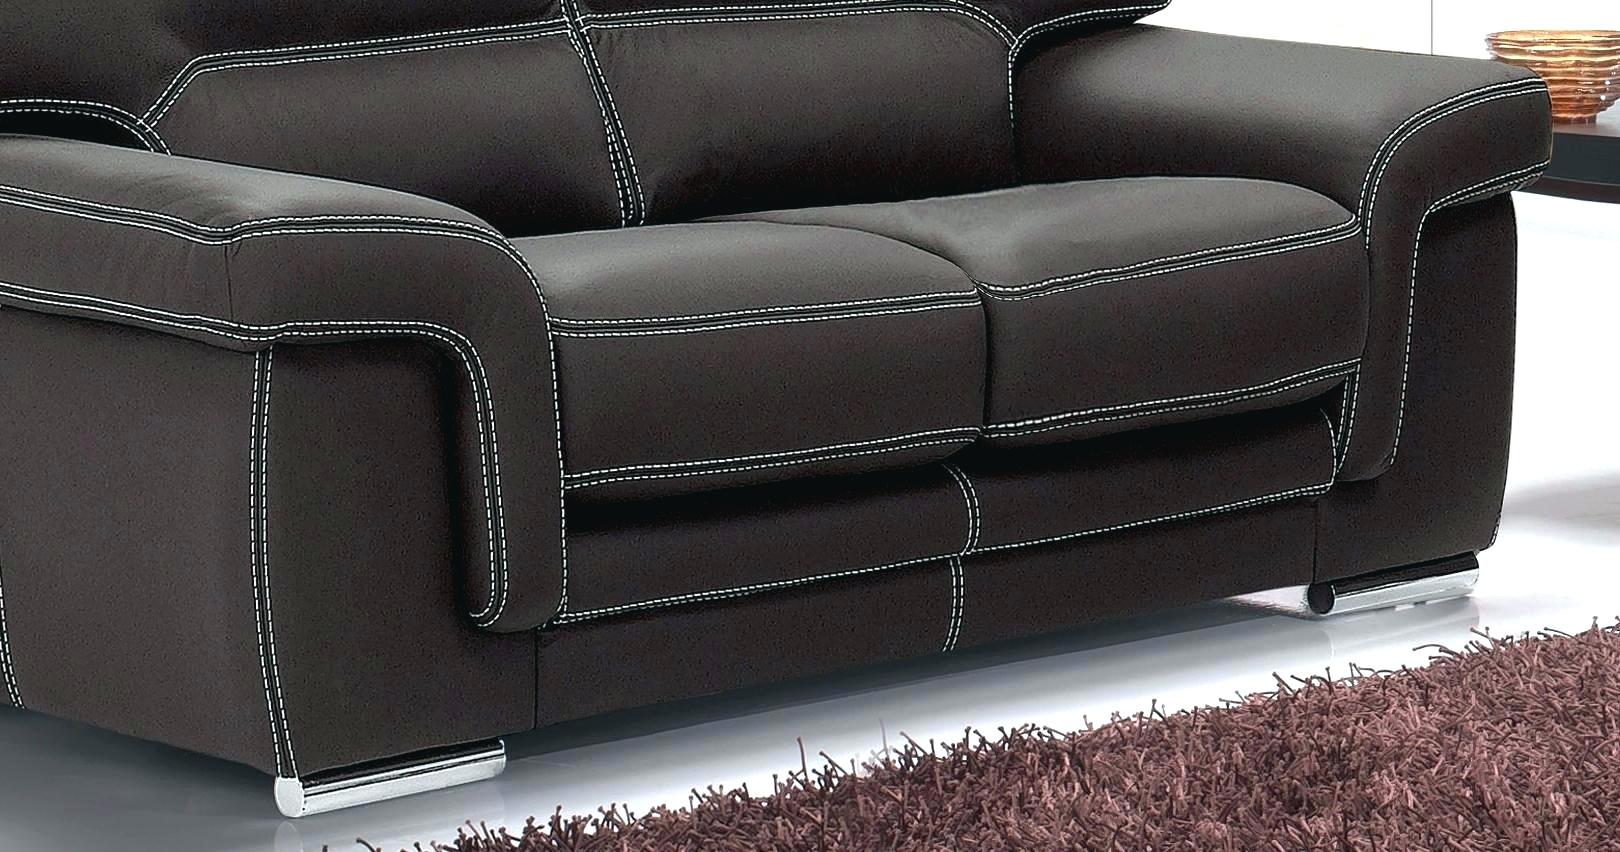 Salon Cuir Buffle Italien canapé cuir de buffle canapé d angle convertible en cuir de